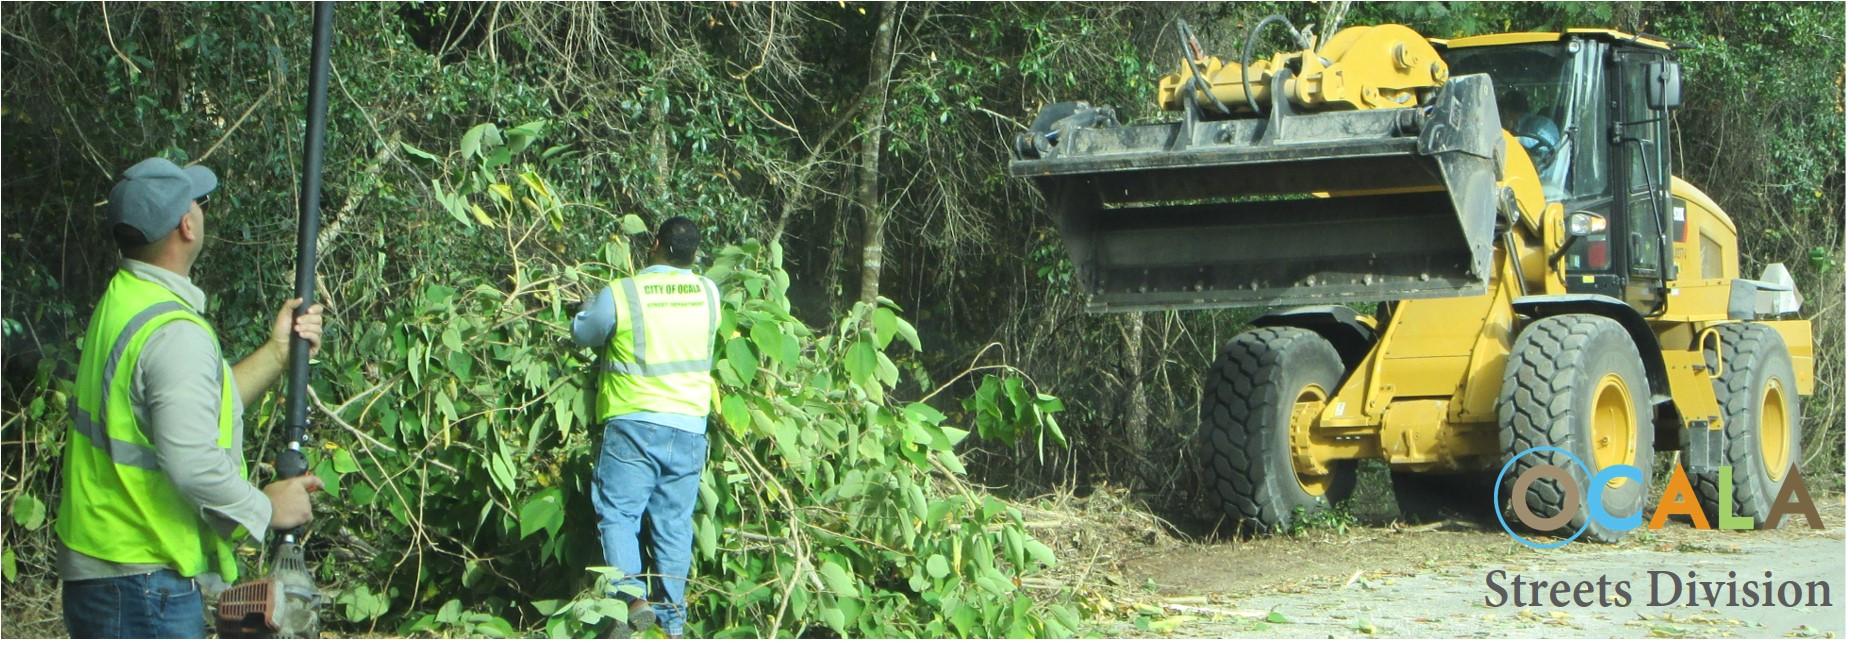 Waste Management Ocala Fl Residential Sanitation City Of Ocala